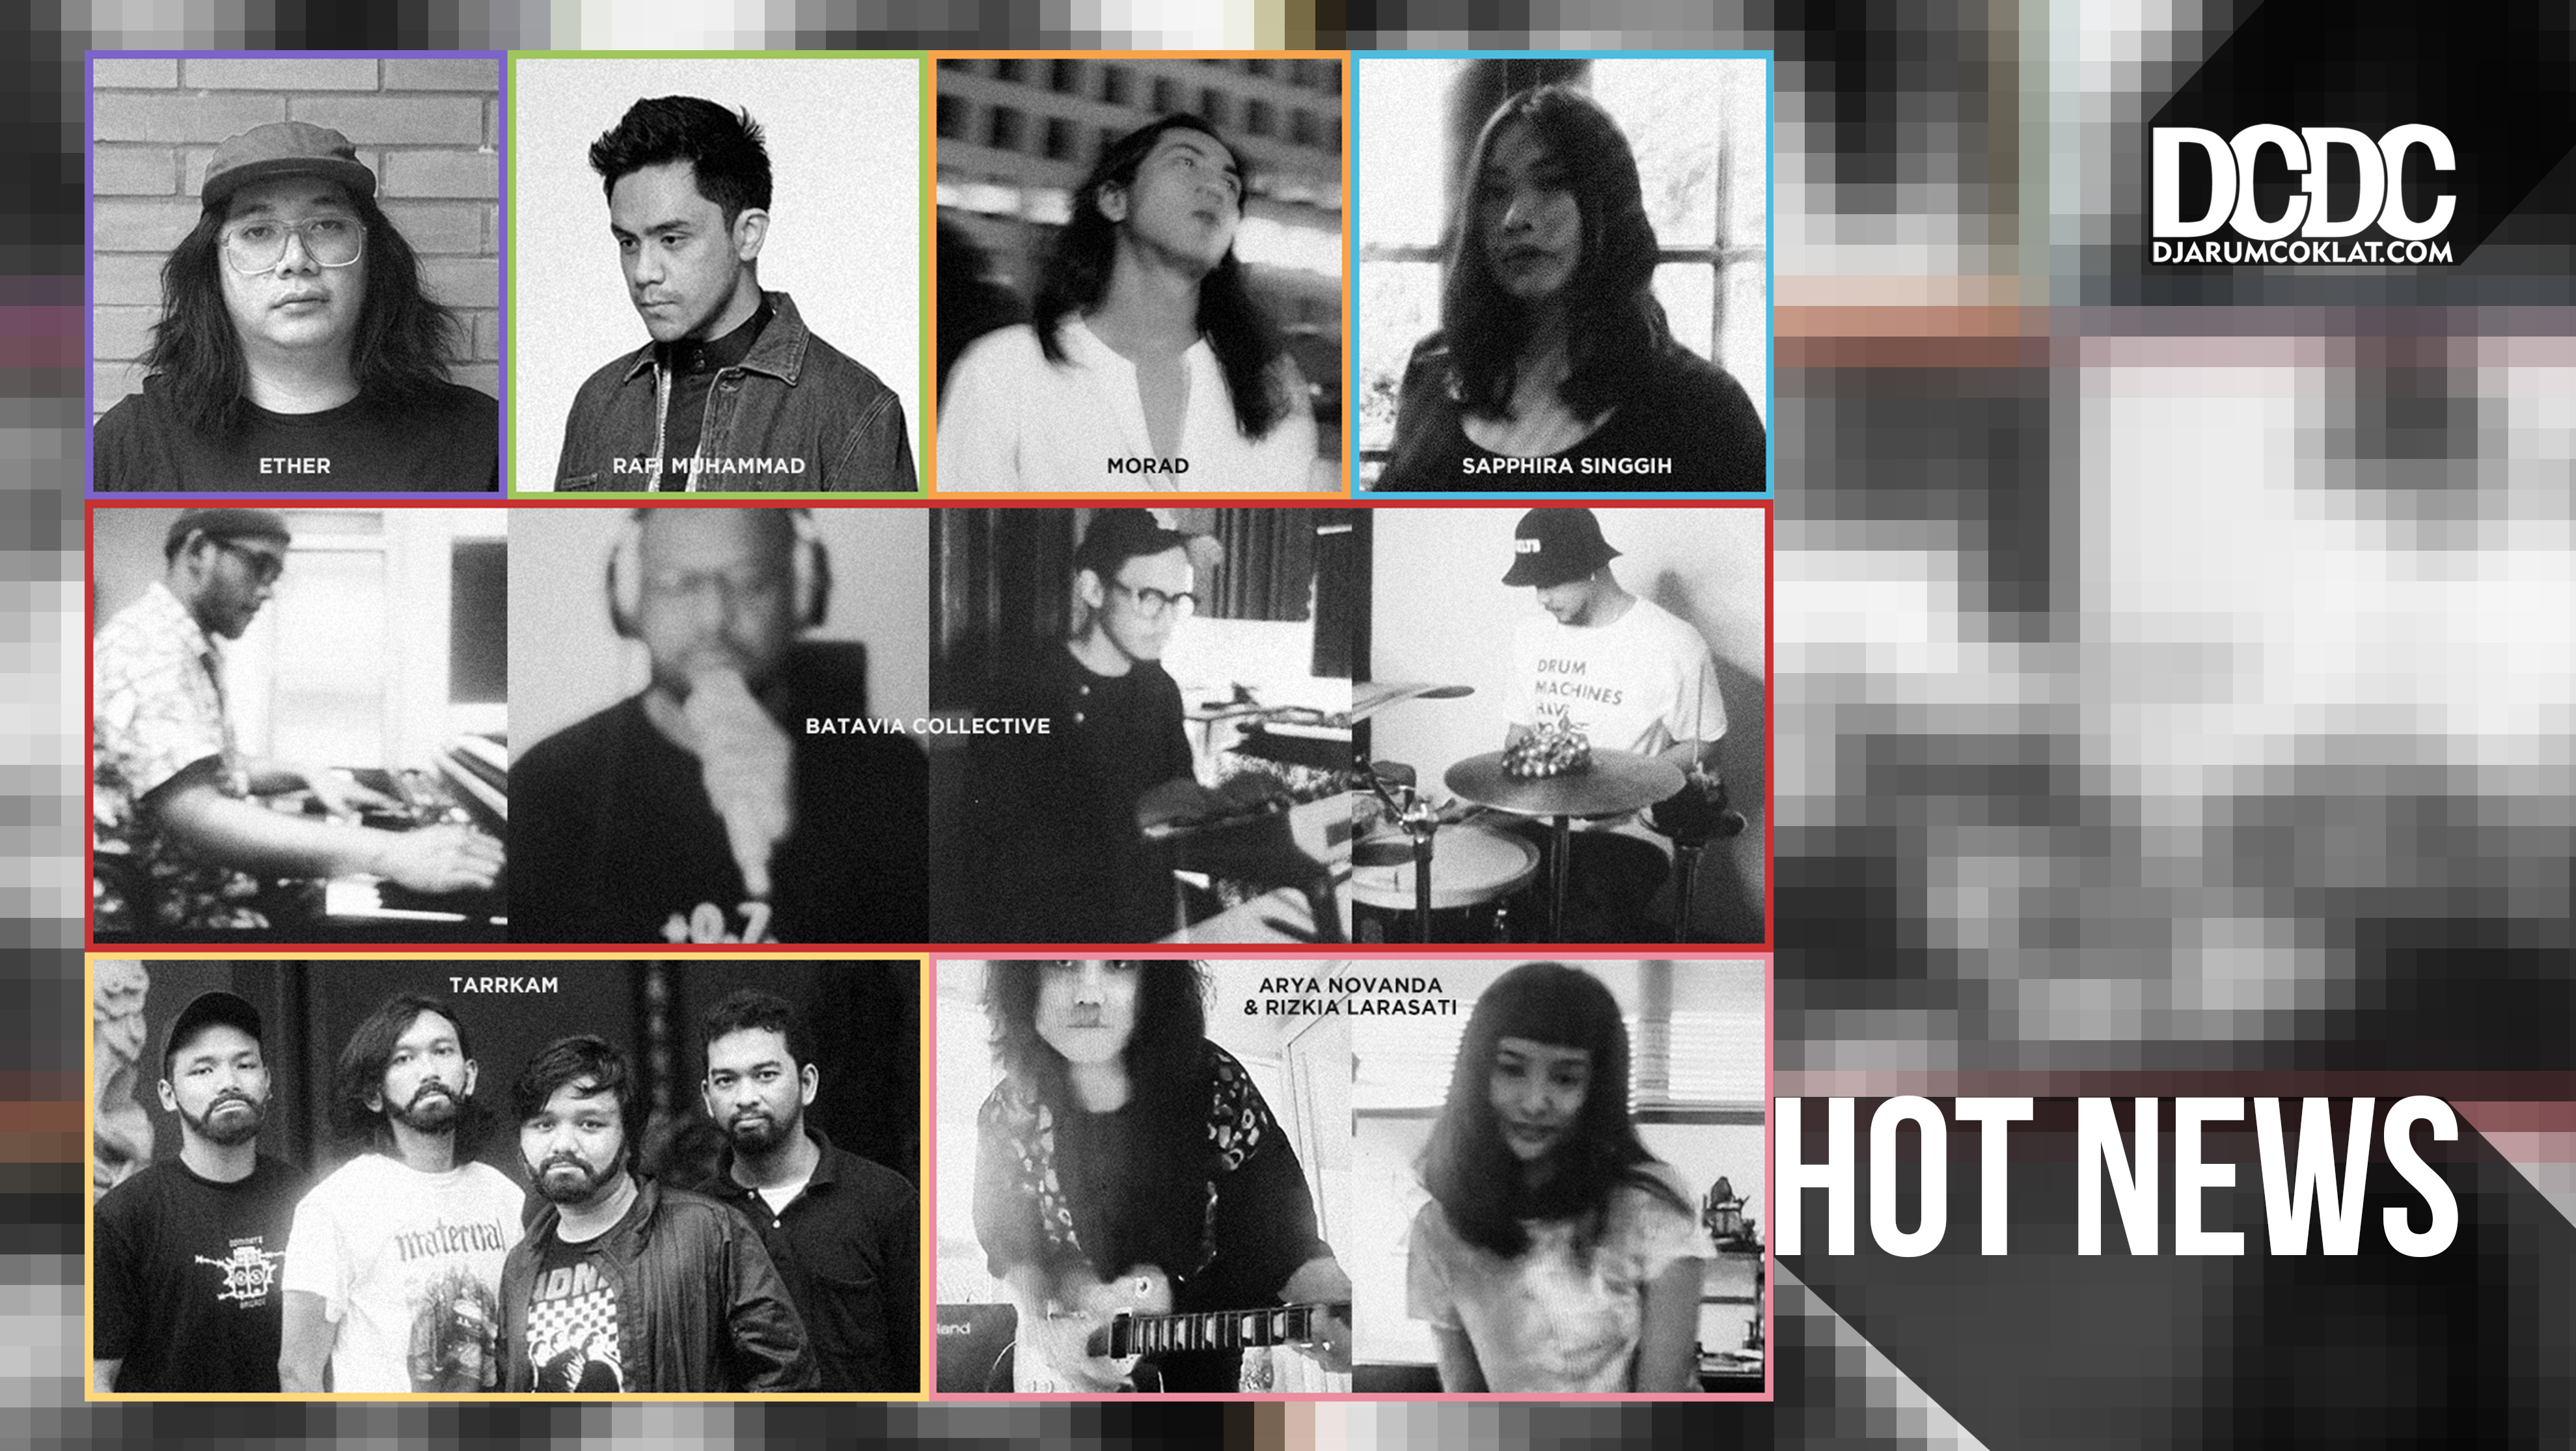 Ulang Tahun Ke-5, Berita Angkasa Rilis Album Kompilasi 'Adiksi Adaptasi'